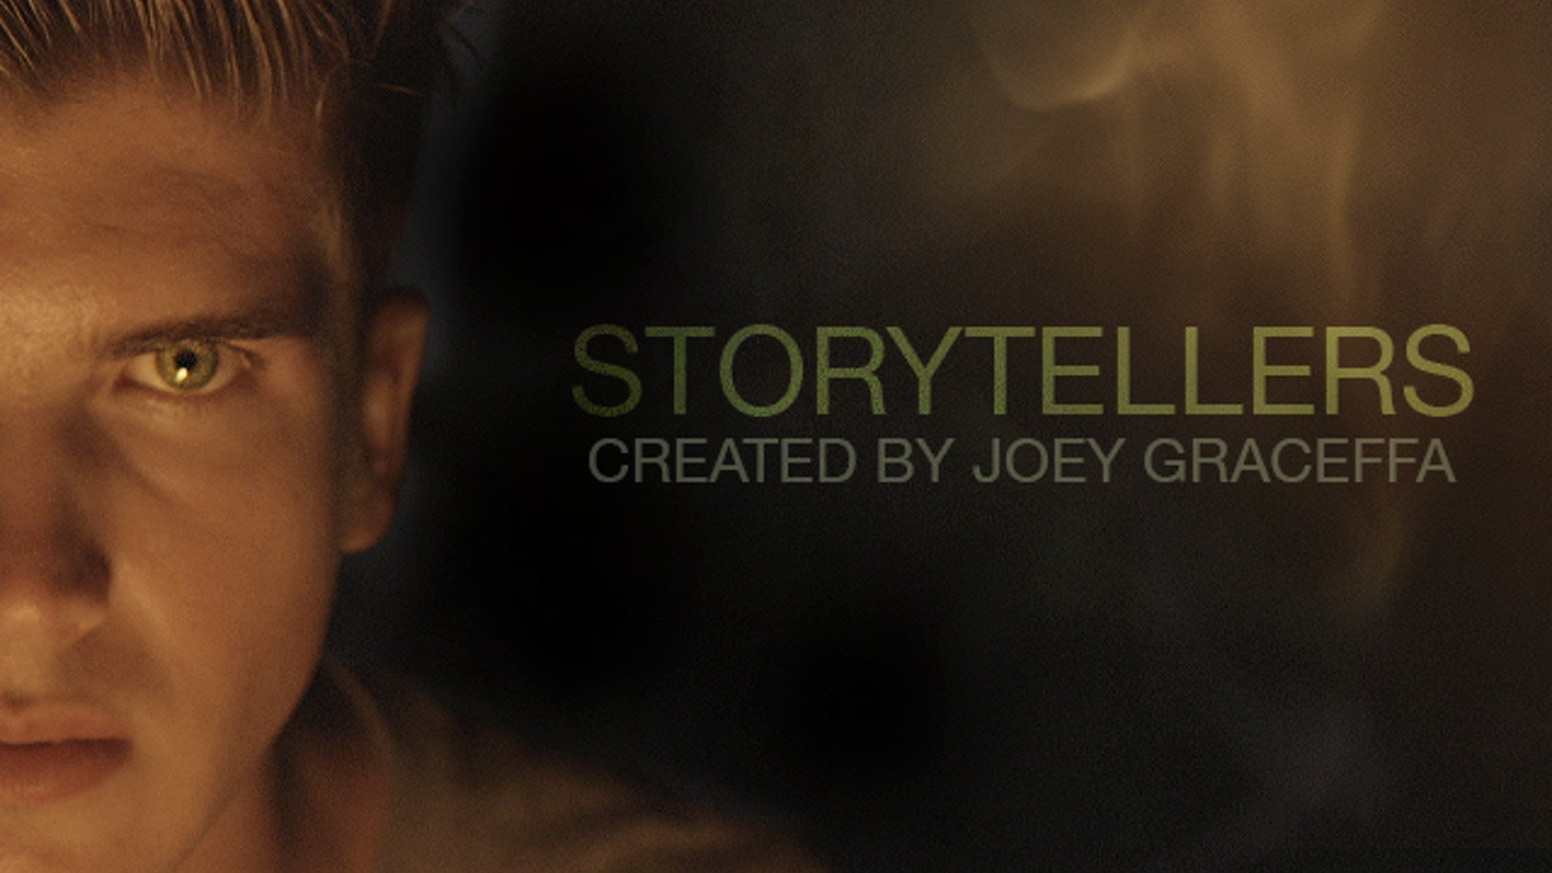 STORYTELLERS: The Series by Joey Graceffa — Kickstarter